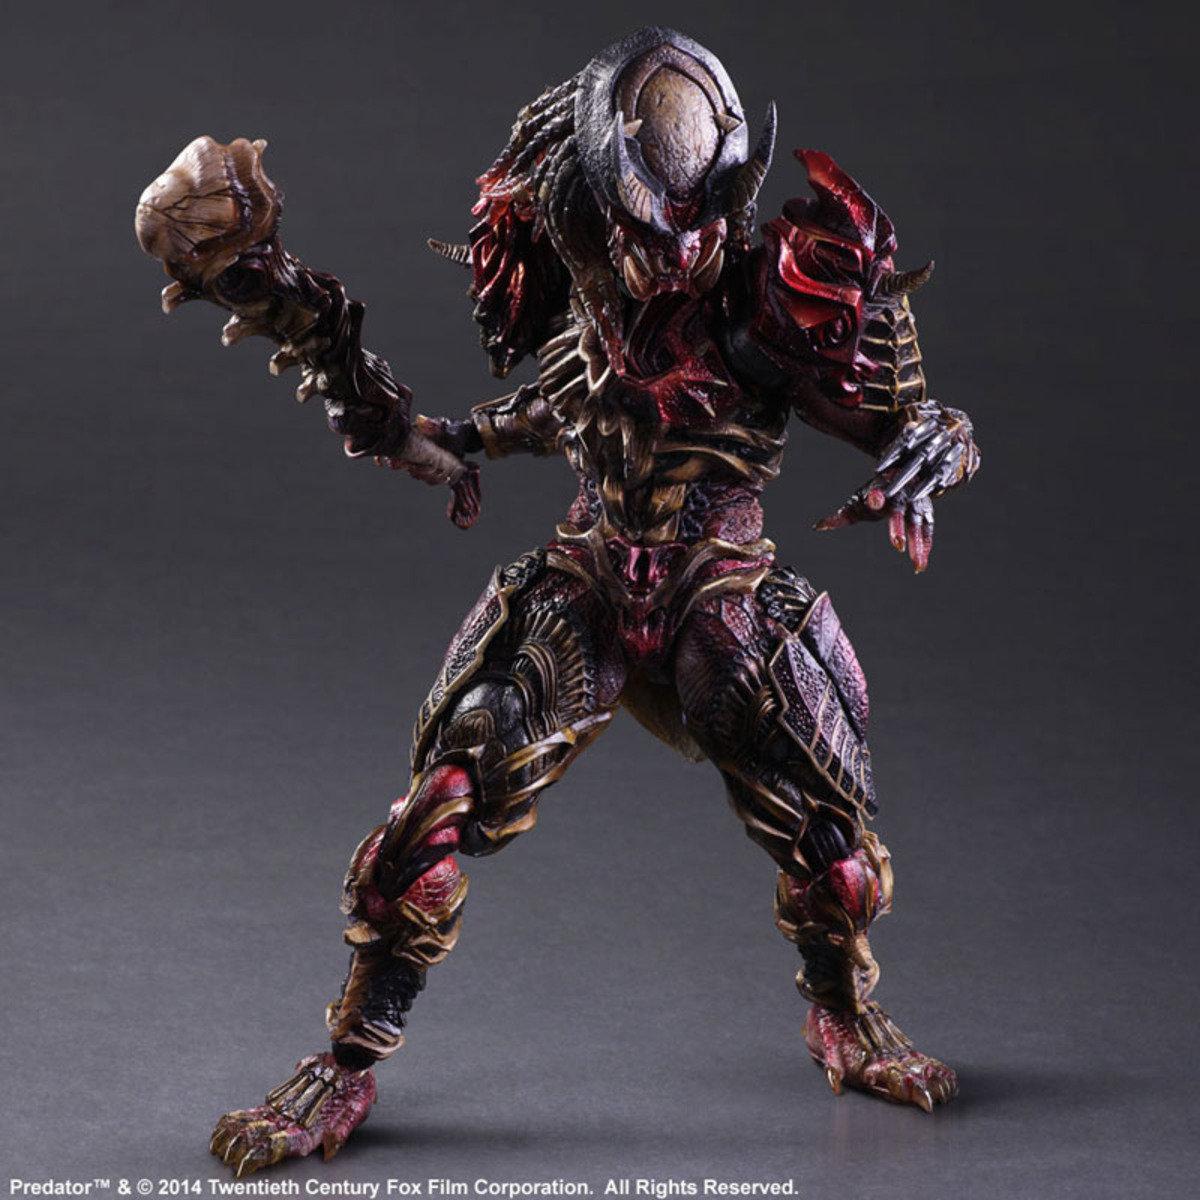 Play Arts改系列 變體版 Predator 鐵血戰士  (Designed by Hitoshi Kondo)